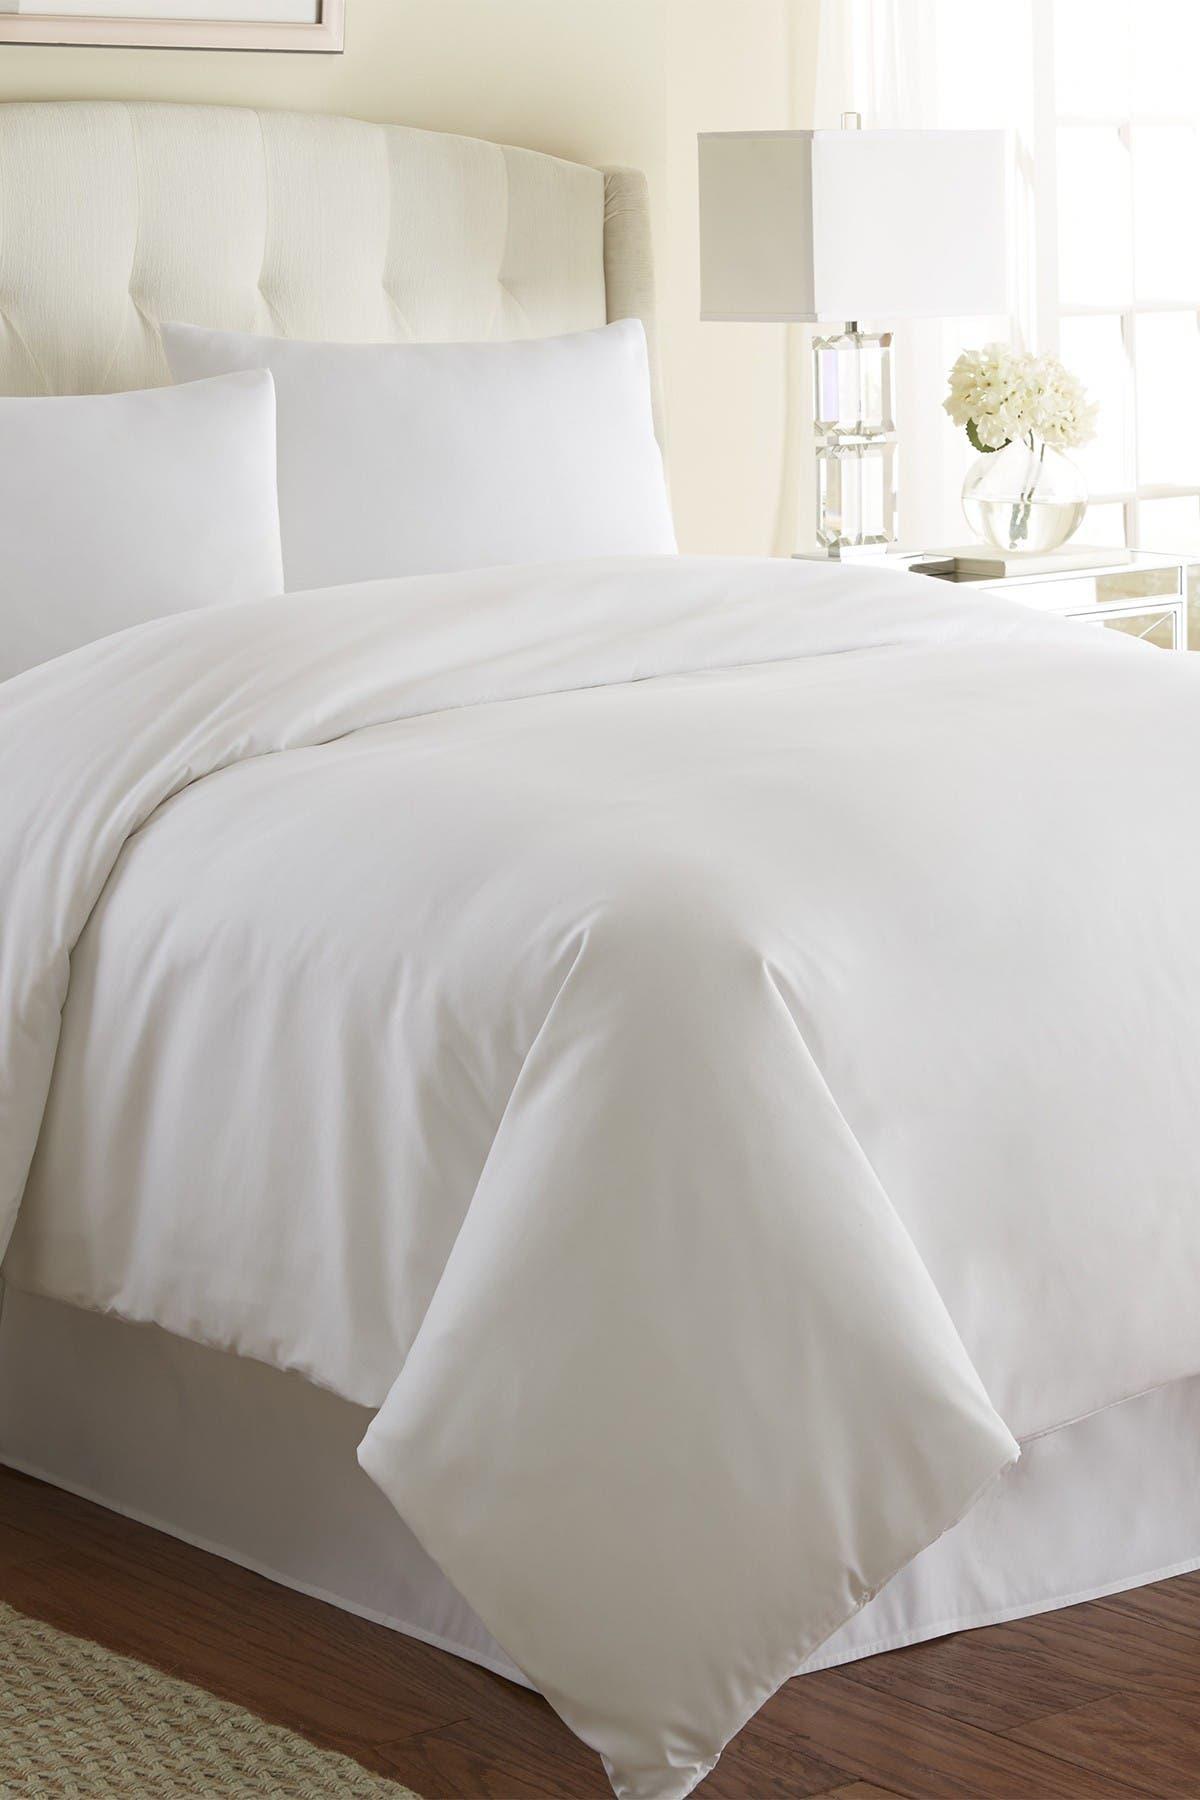 Image of SOUTHSHORE FINE LINENS Full/Queen Southshore Fine Linens Vilano Springs Duvet Cover Sets - Bright White